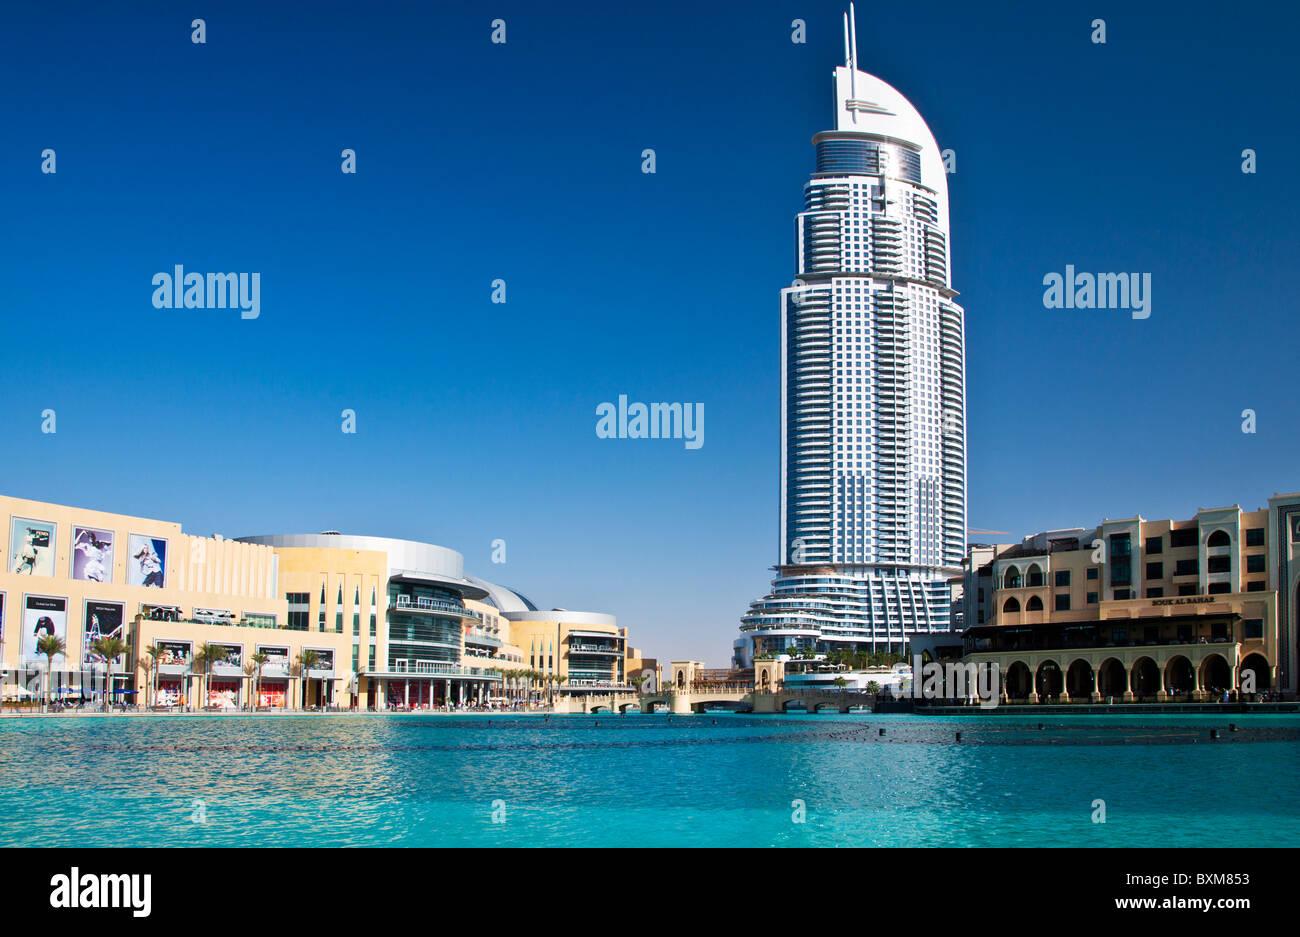 The Dubai Mall and the 5 star luxury Address Hotel and Souk al Bahar in Downtown Dubai, United Arab Emirates, UAE - Stock Image